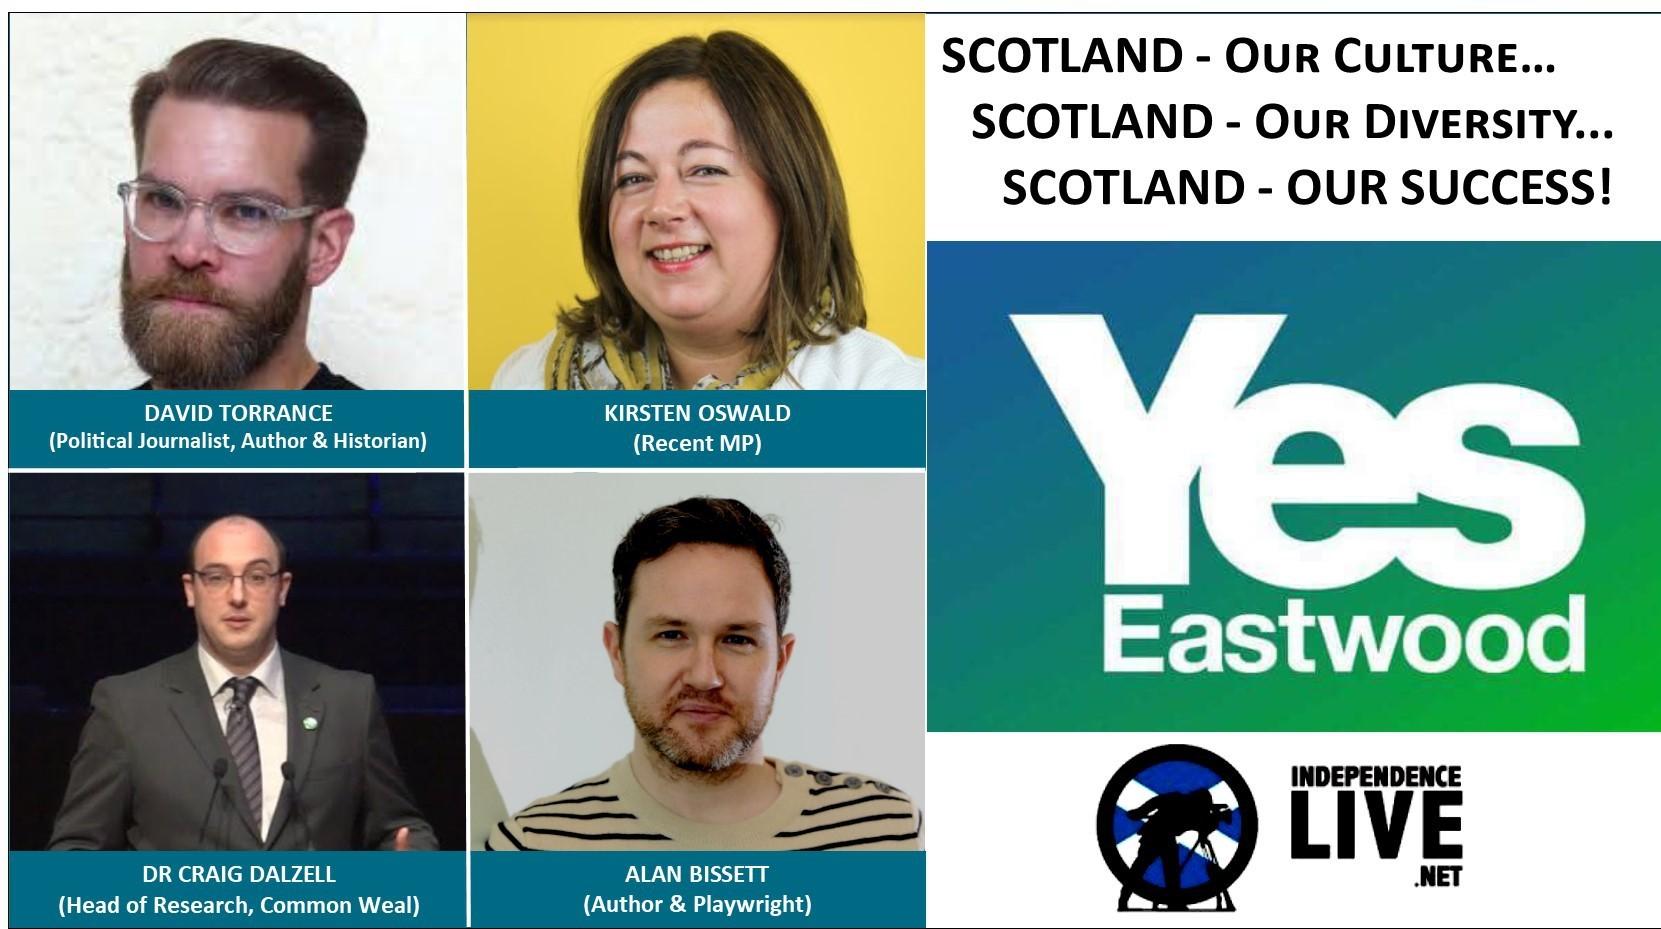 Scotland - Our Culture